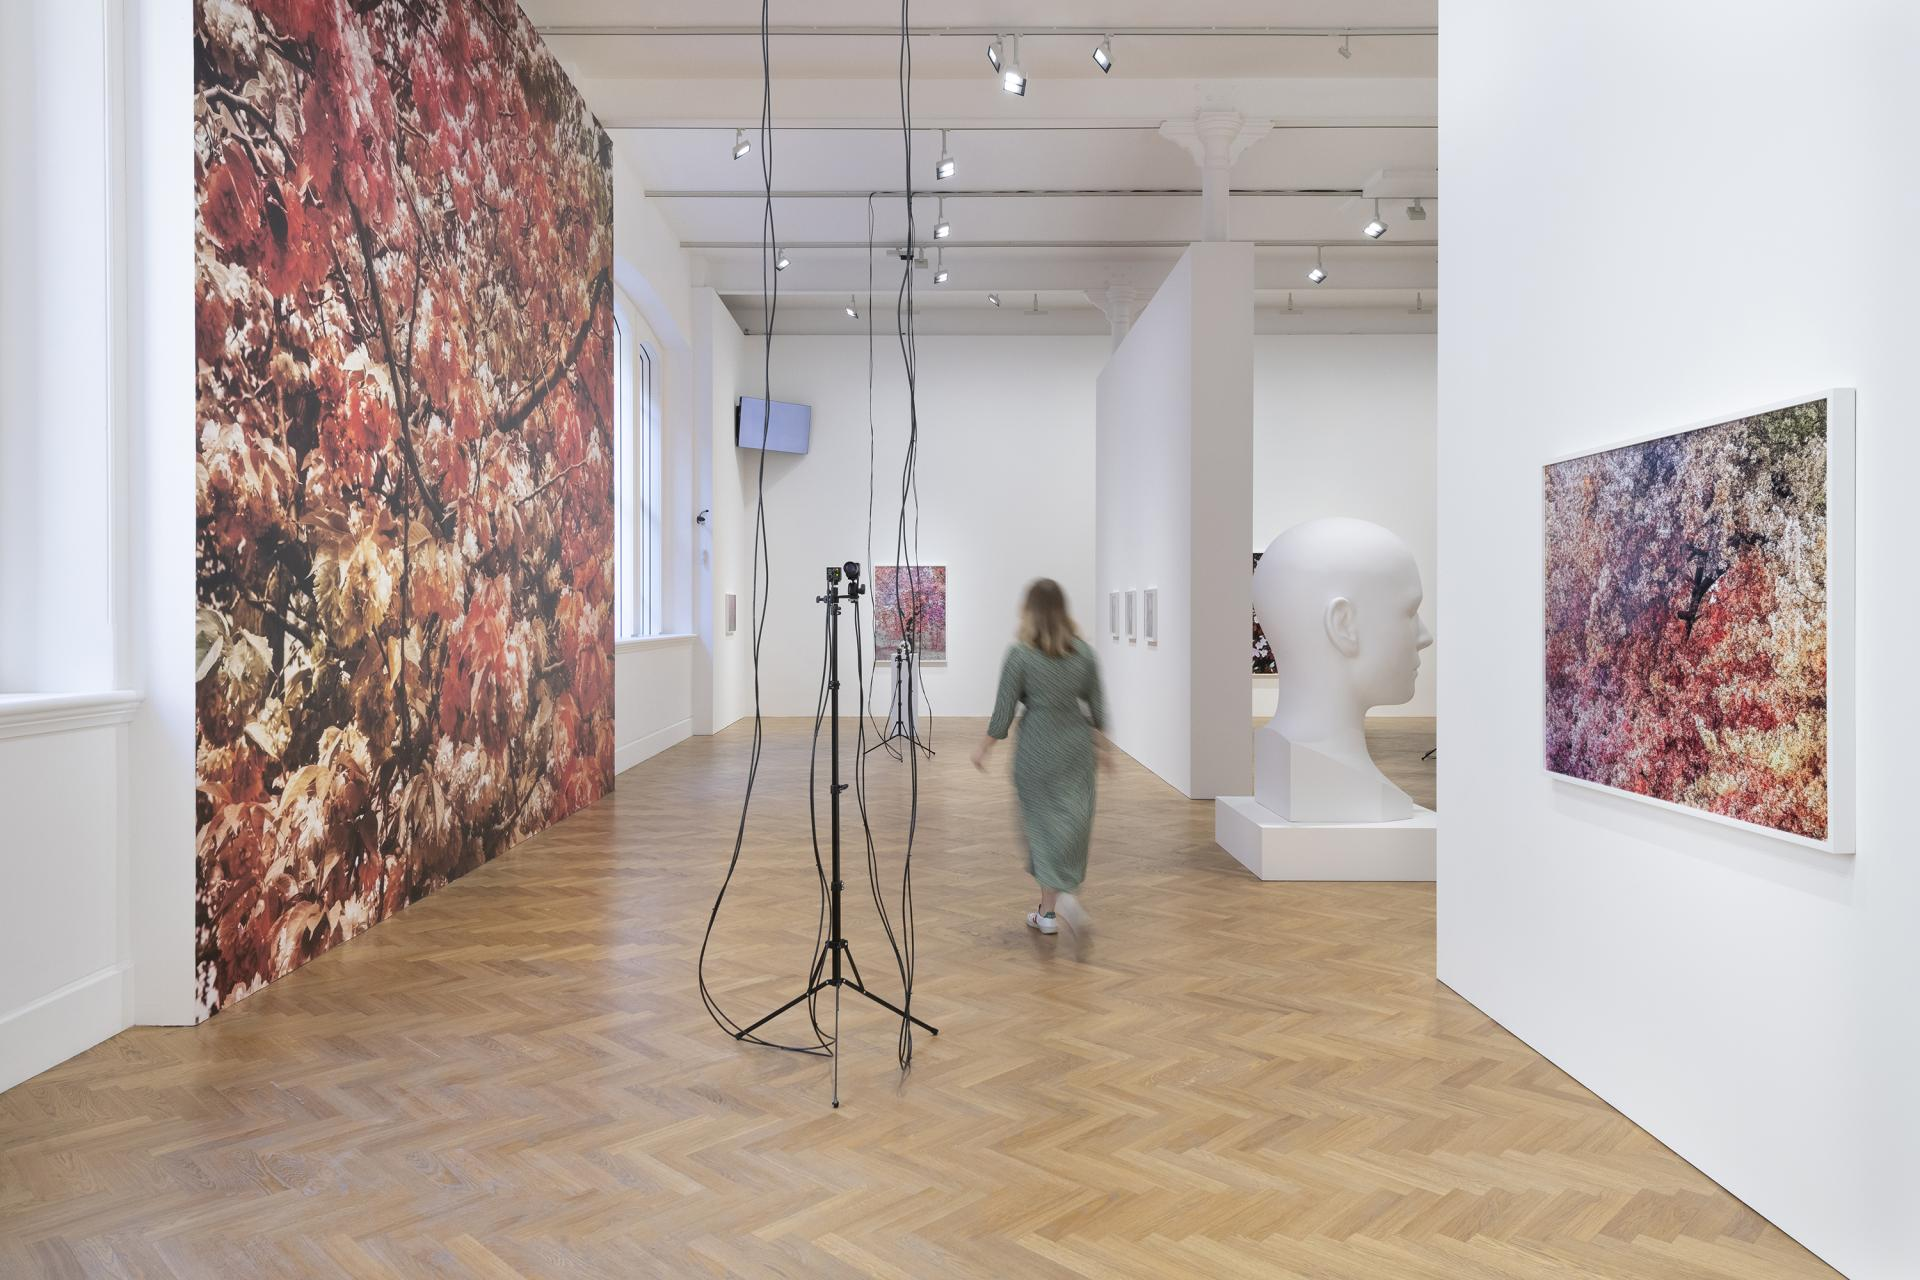 Installation view of Trevor Paglen: Bloom, Pace Gallery, 6 Burlington Gardens, London, September 10 – November 10, 2020.